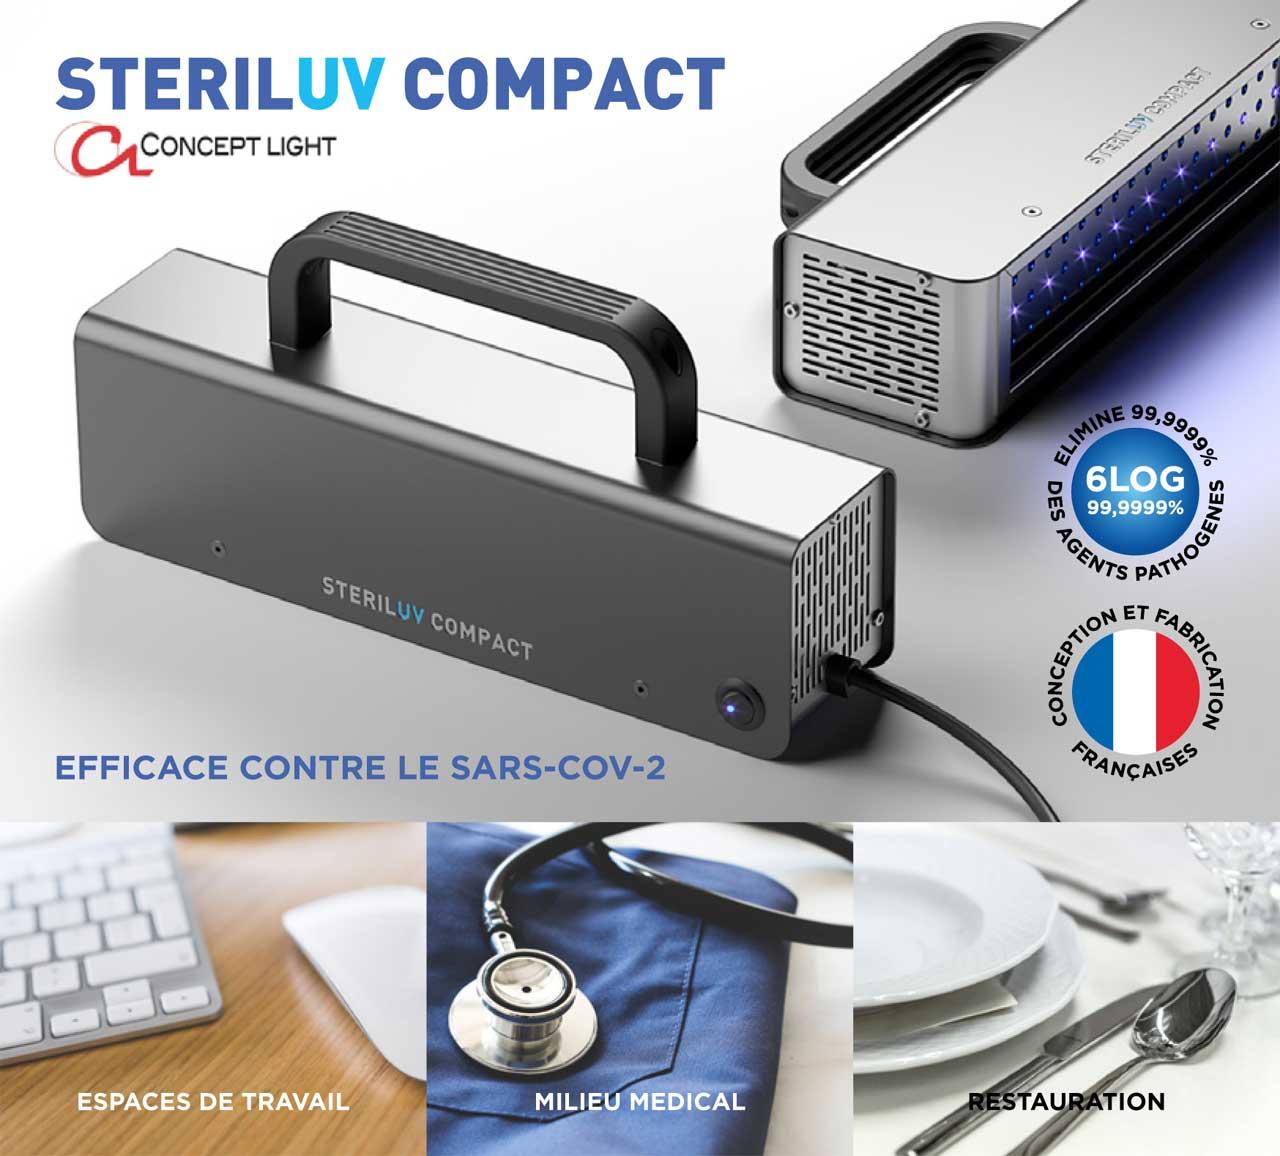 featured image STERILUV COMPACT LED Appareil portatif de Desinfection UV LED Concept Light mabani